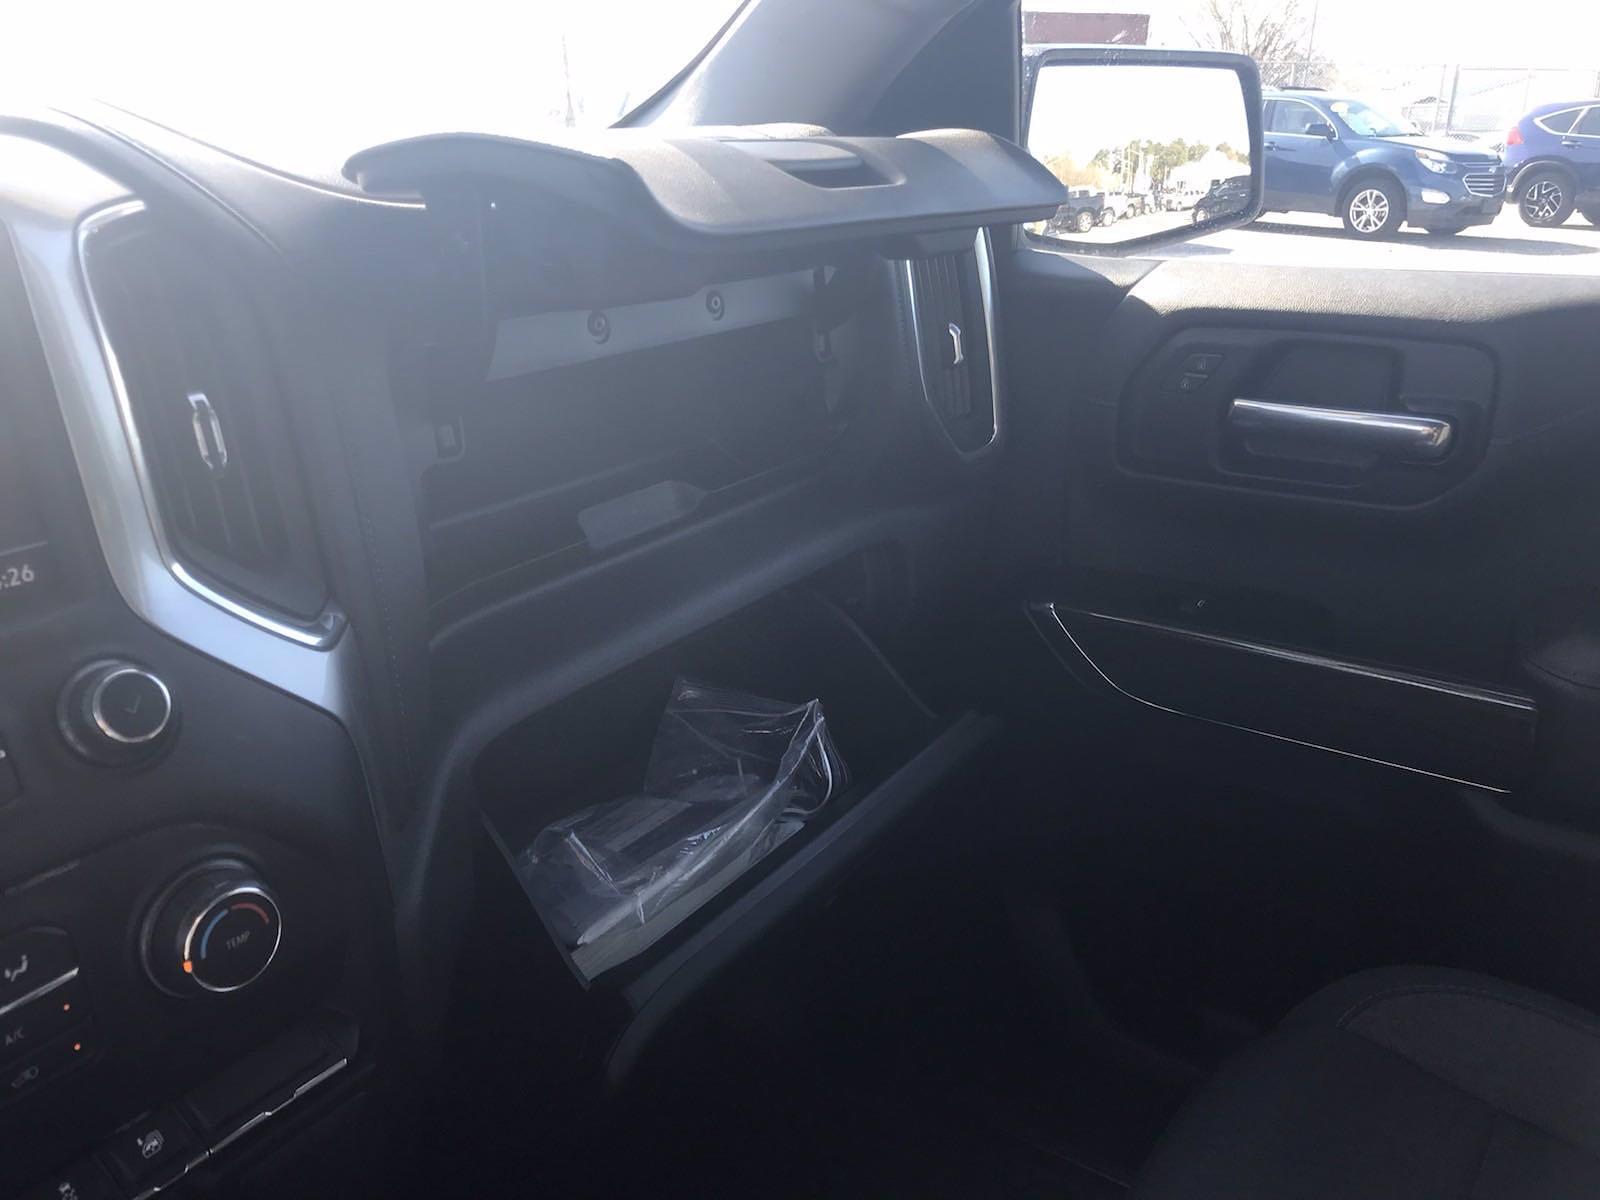 2020 Chevrolet Silverado 1500 Crew Cab 4x4, Pickup #16450P - photo 36